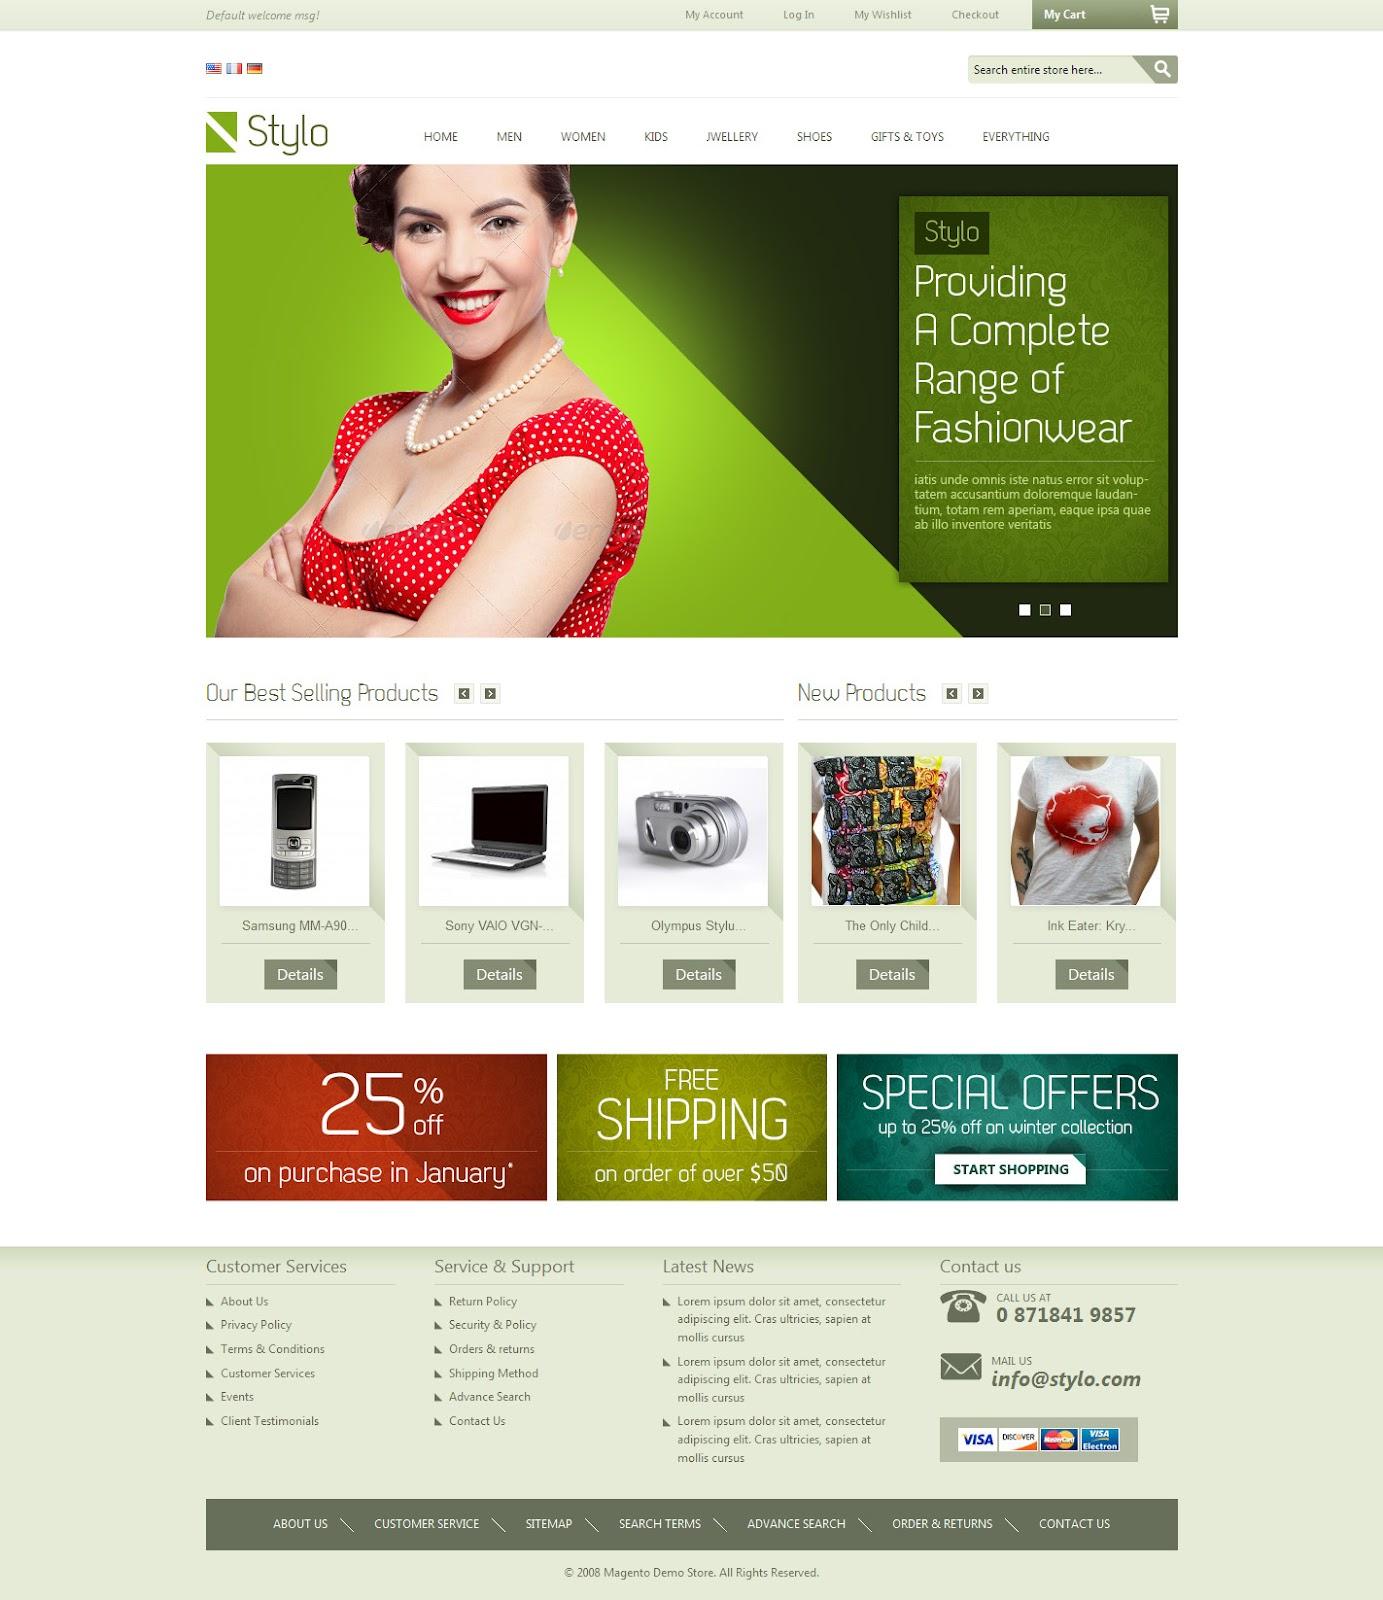 Stylo-Magento-Theme-customize-Modern-Stylish-Templates